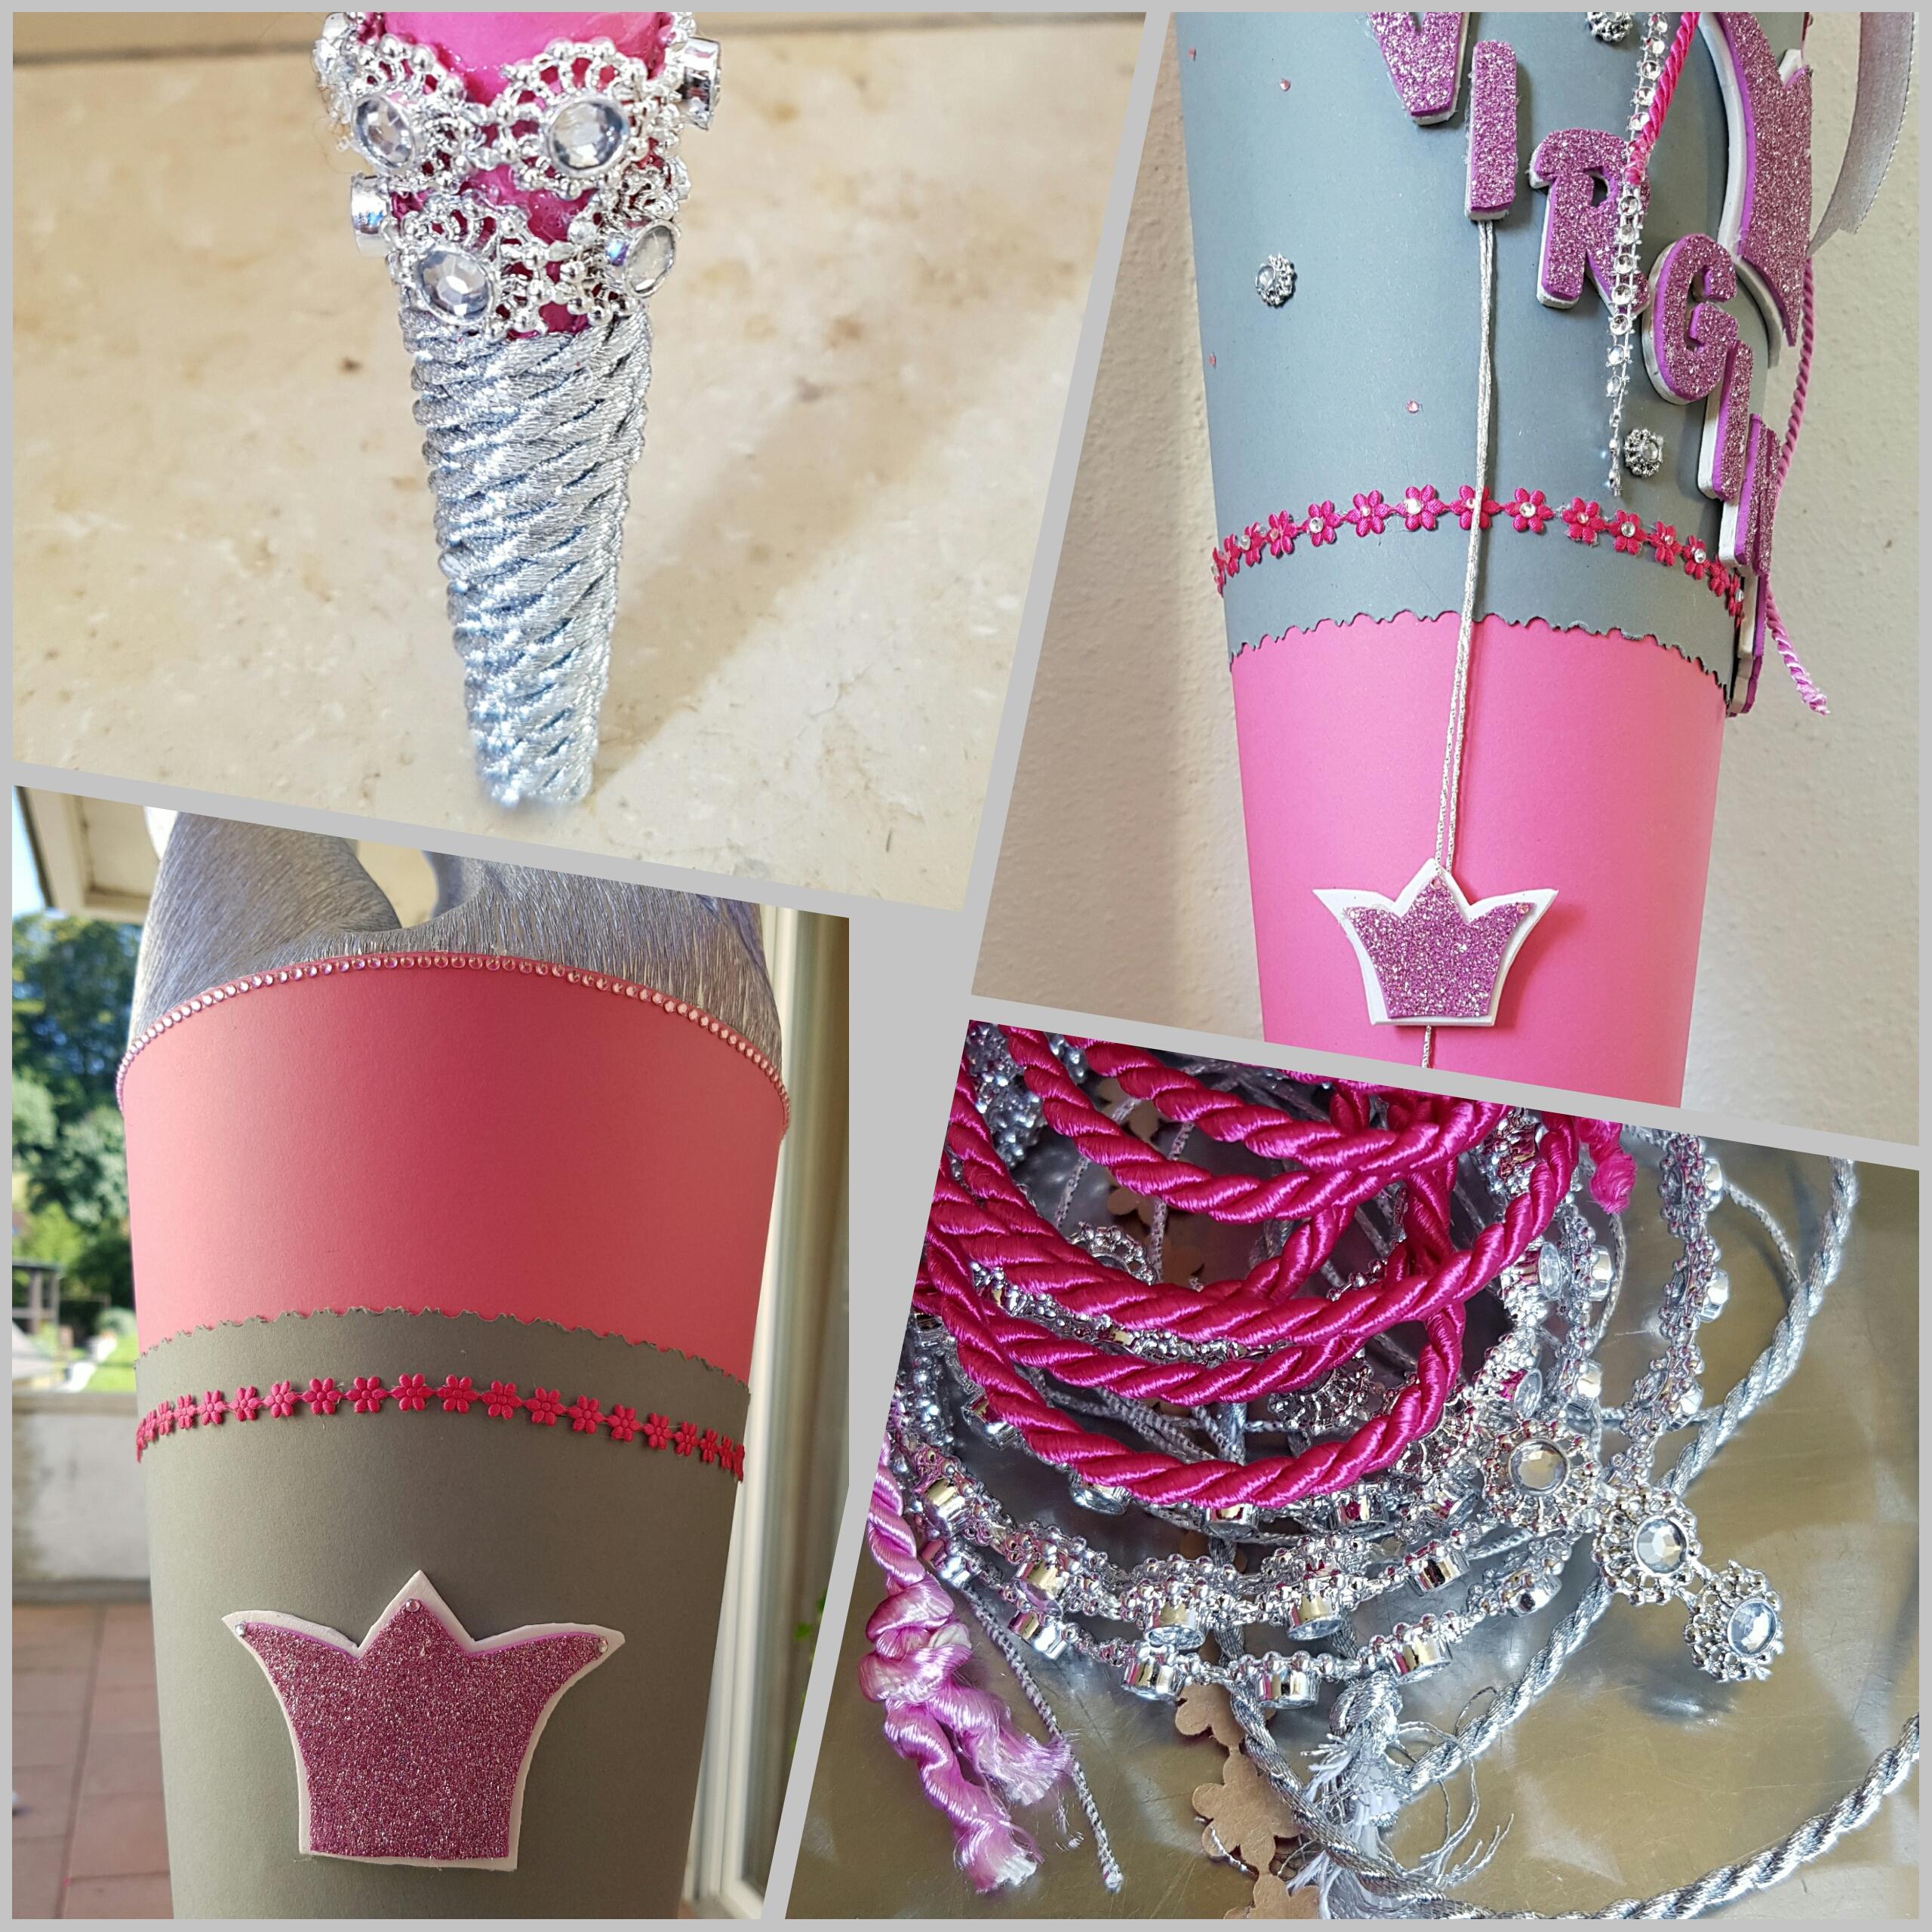 Details rosa Prinzessin Schultüte selber basteln